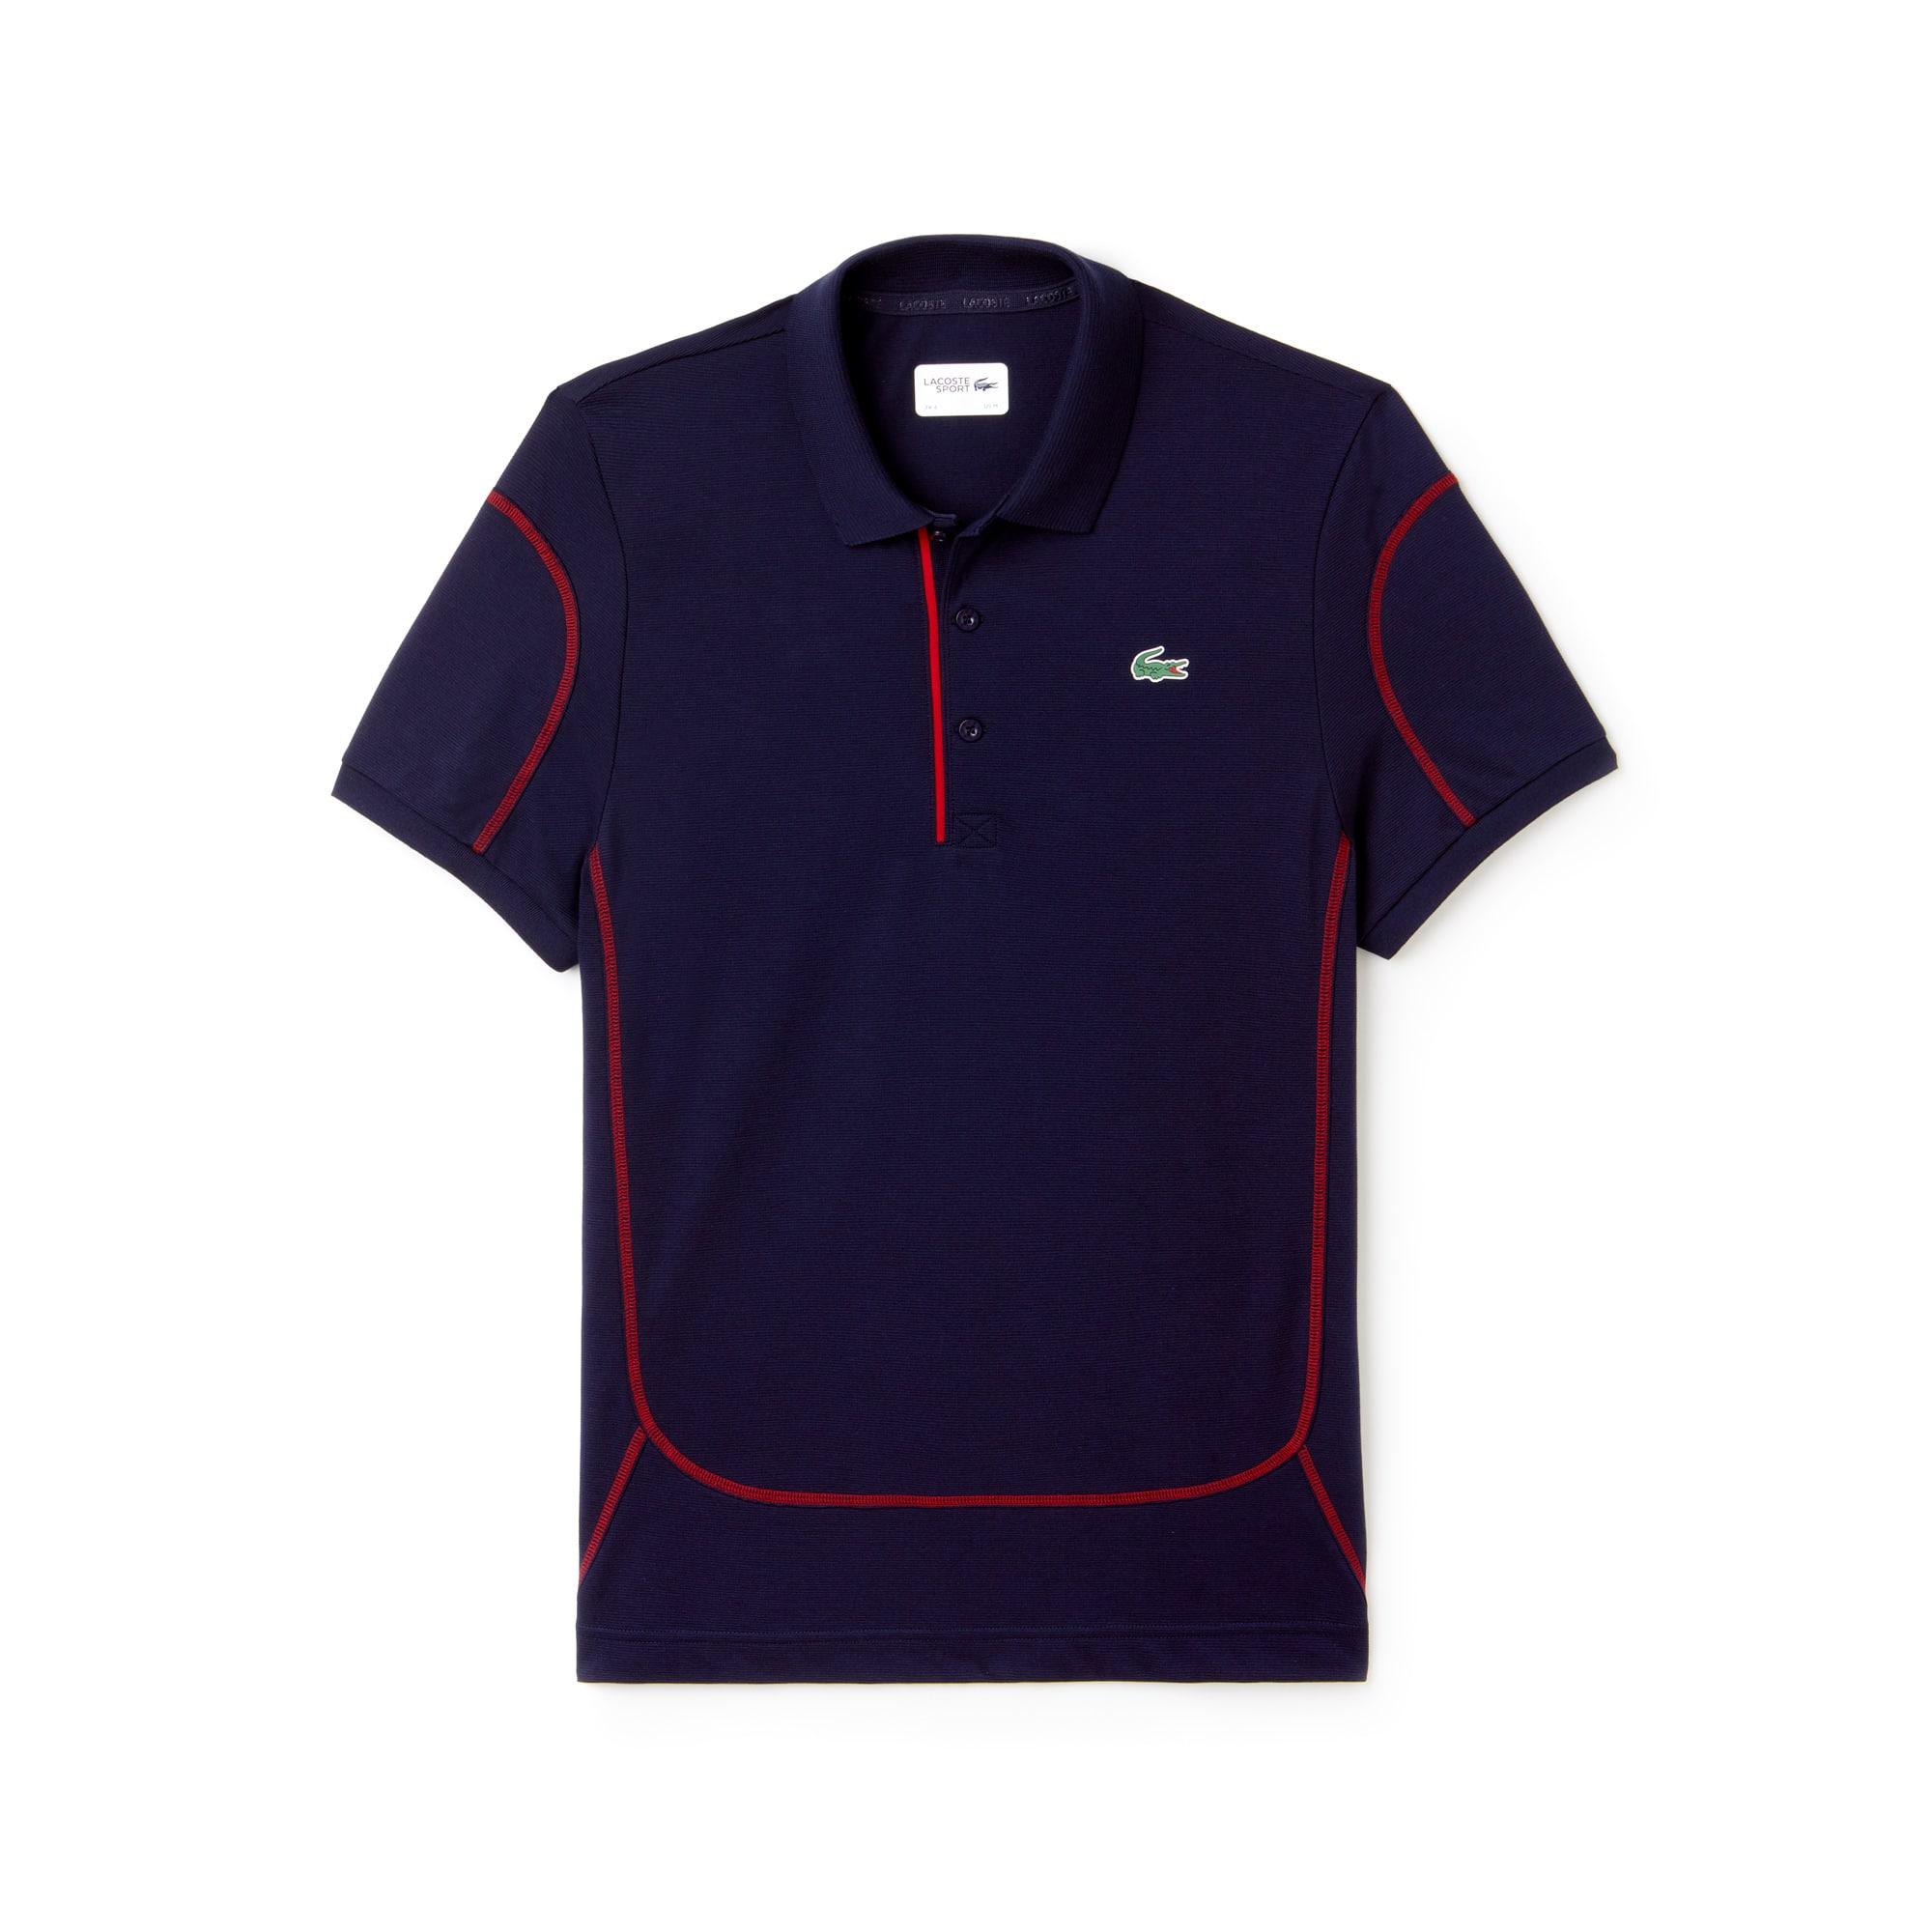 Herren LACOSTE SPORT Tennis-Poloshirt mit Kontrastnähten